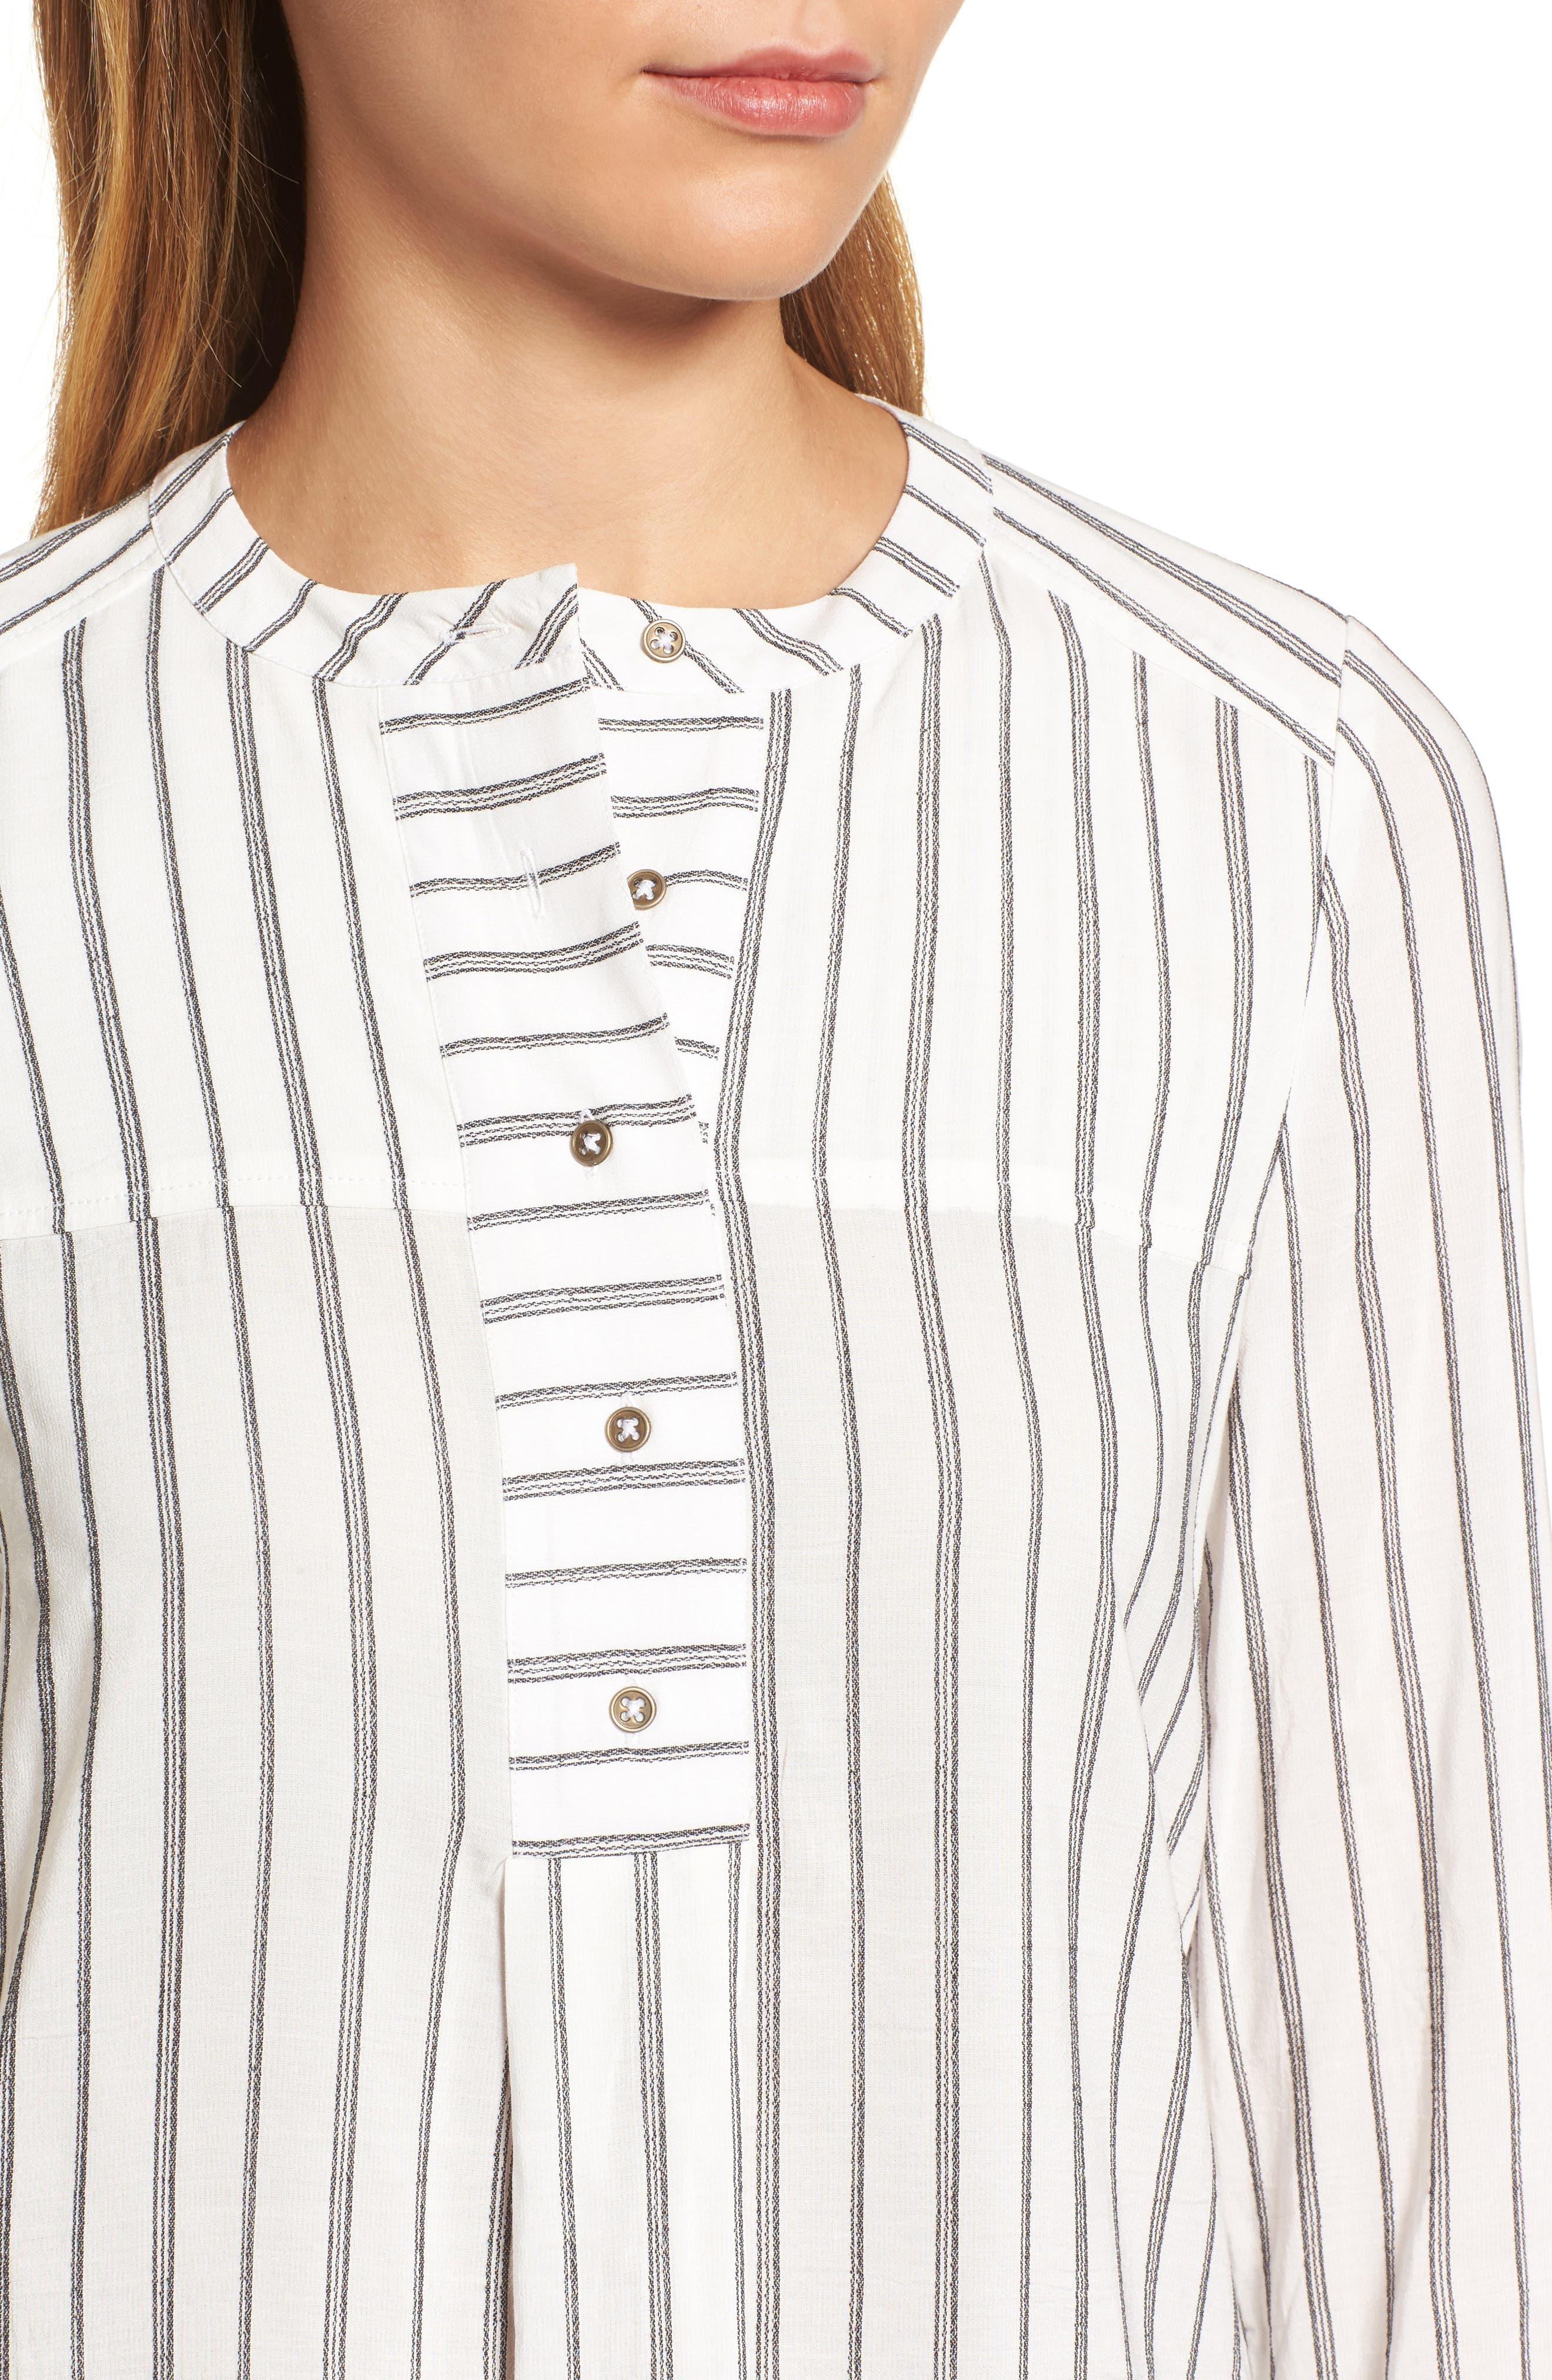 Woven Stripe Top,                             Alternate thumbnail 4, color,                             110